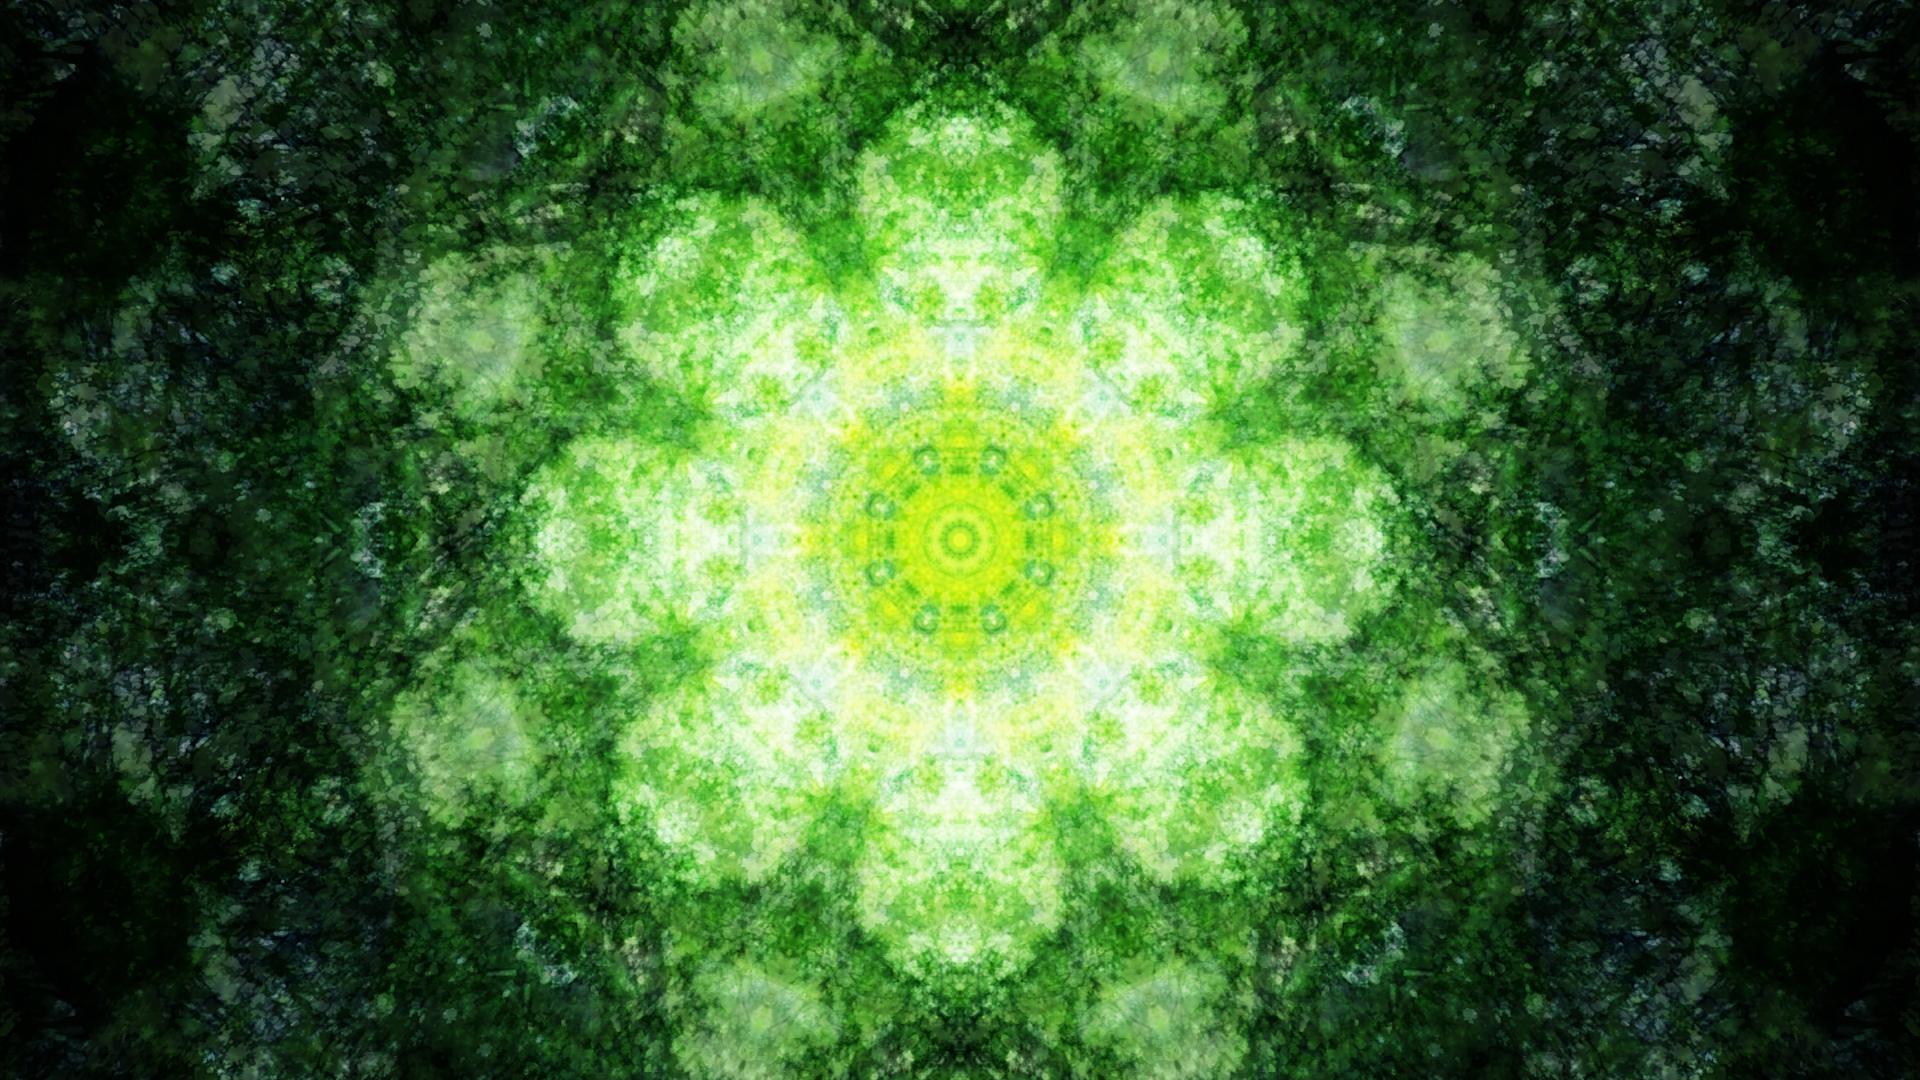 Emitting Velocity - Mohican Forest by Matt Swift Still 9